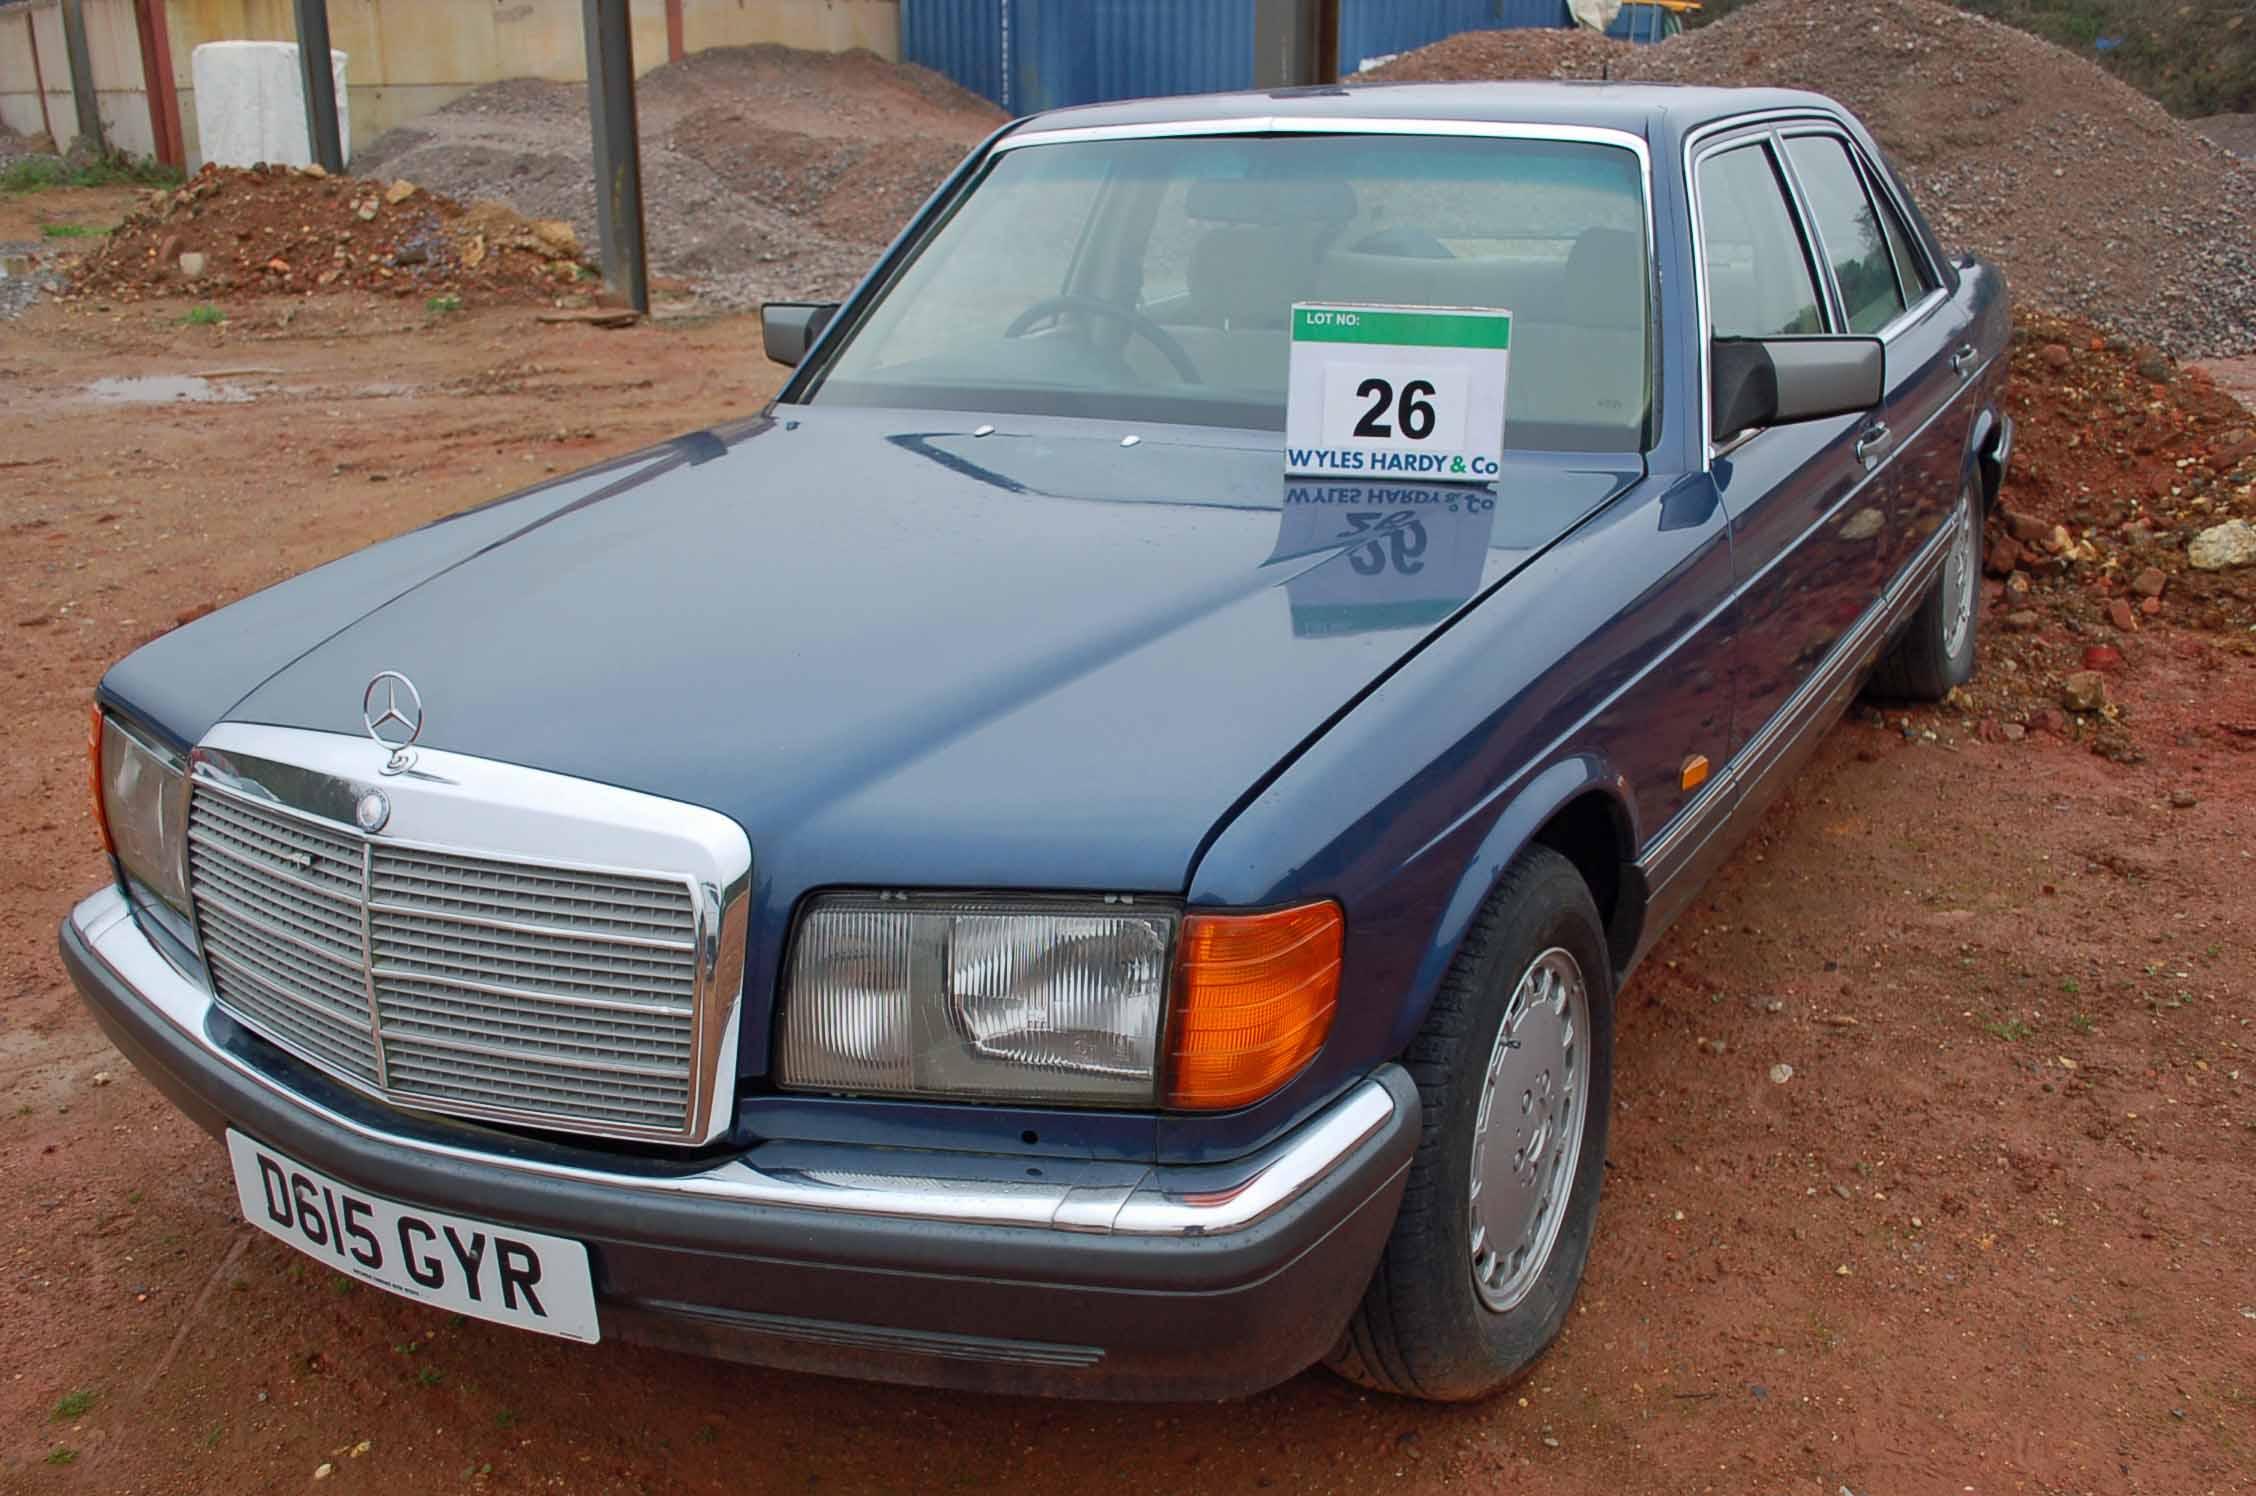 Lot 26 - A MERCEDES 300 SE 4-Door Auto, Registration No. D615 GYR, First Registered: 13/03/1987, Recorded